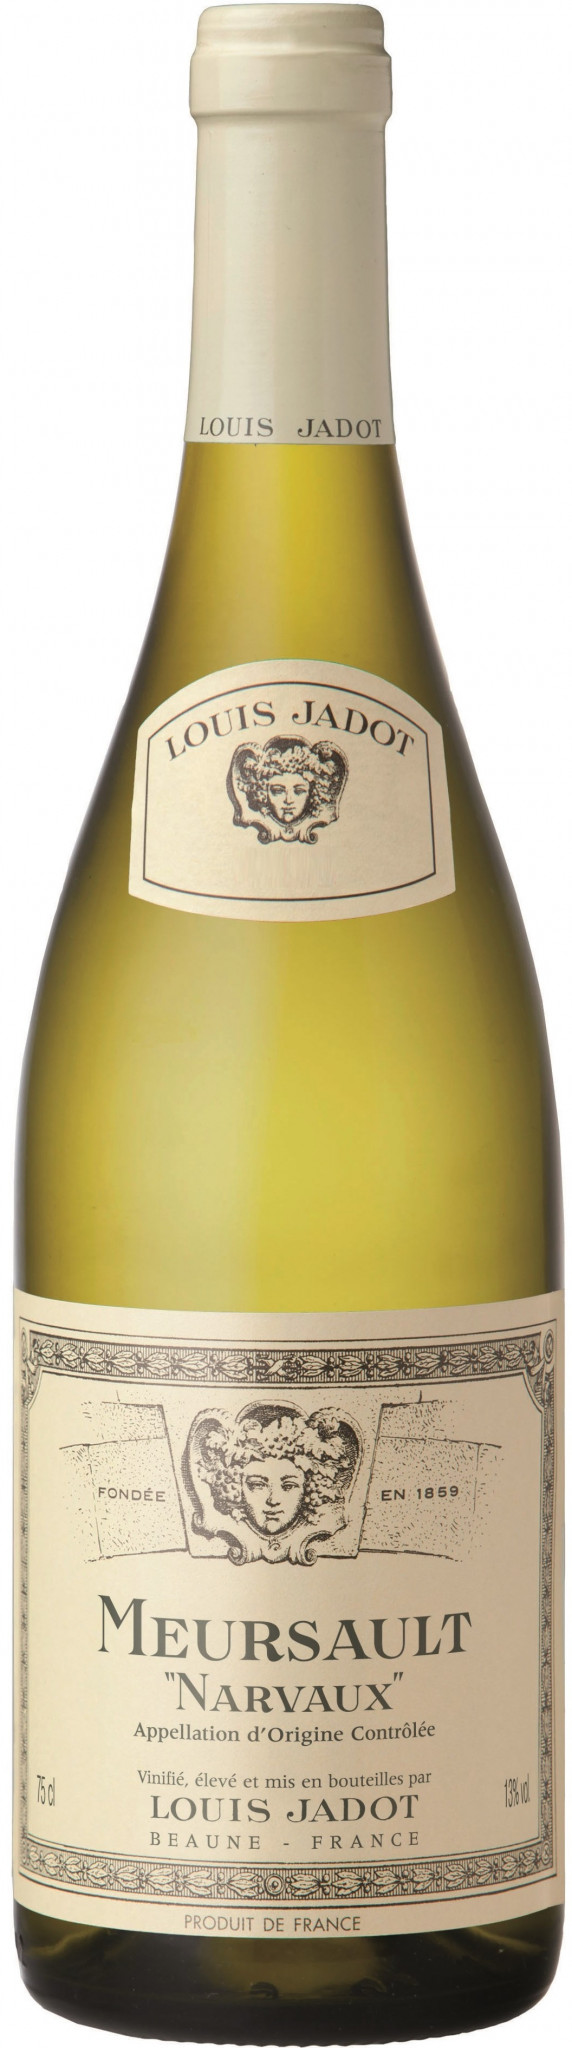 Louis Jadot Meursault Narvaux - wineaffair